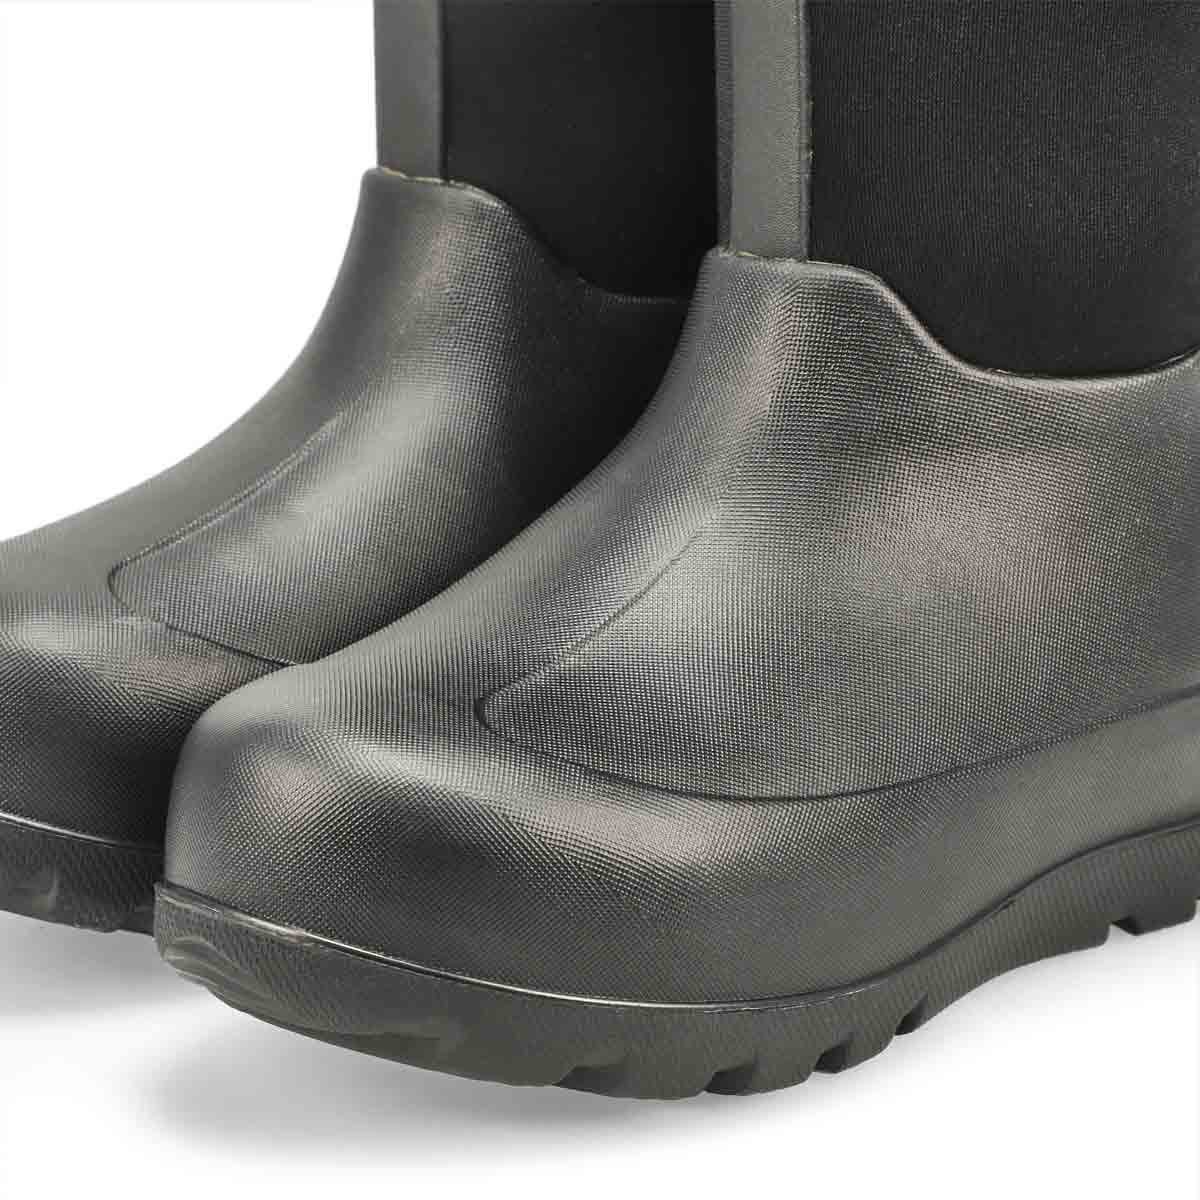 Kid's Neo-Classic Waterproof Winter Boot - Black